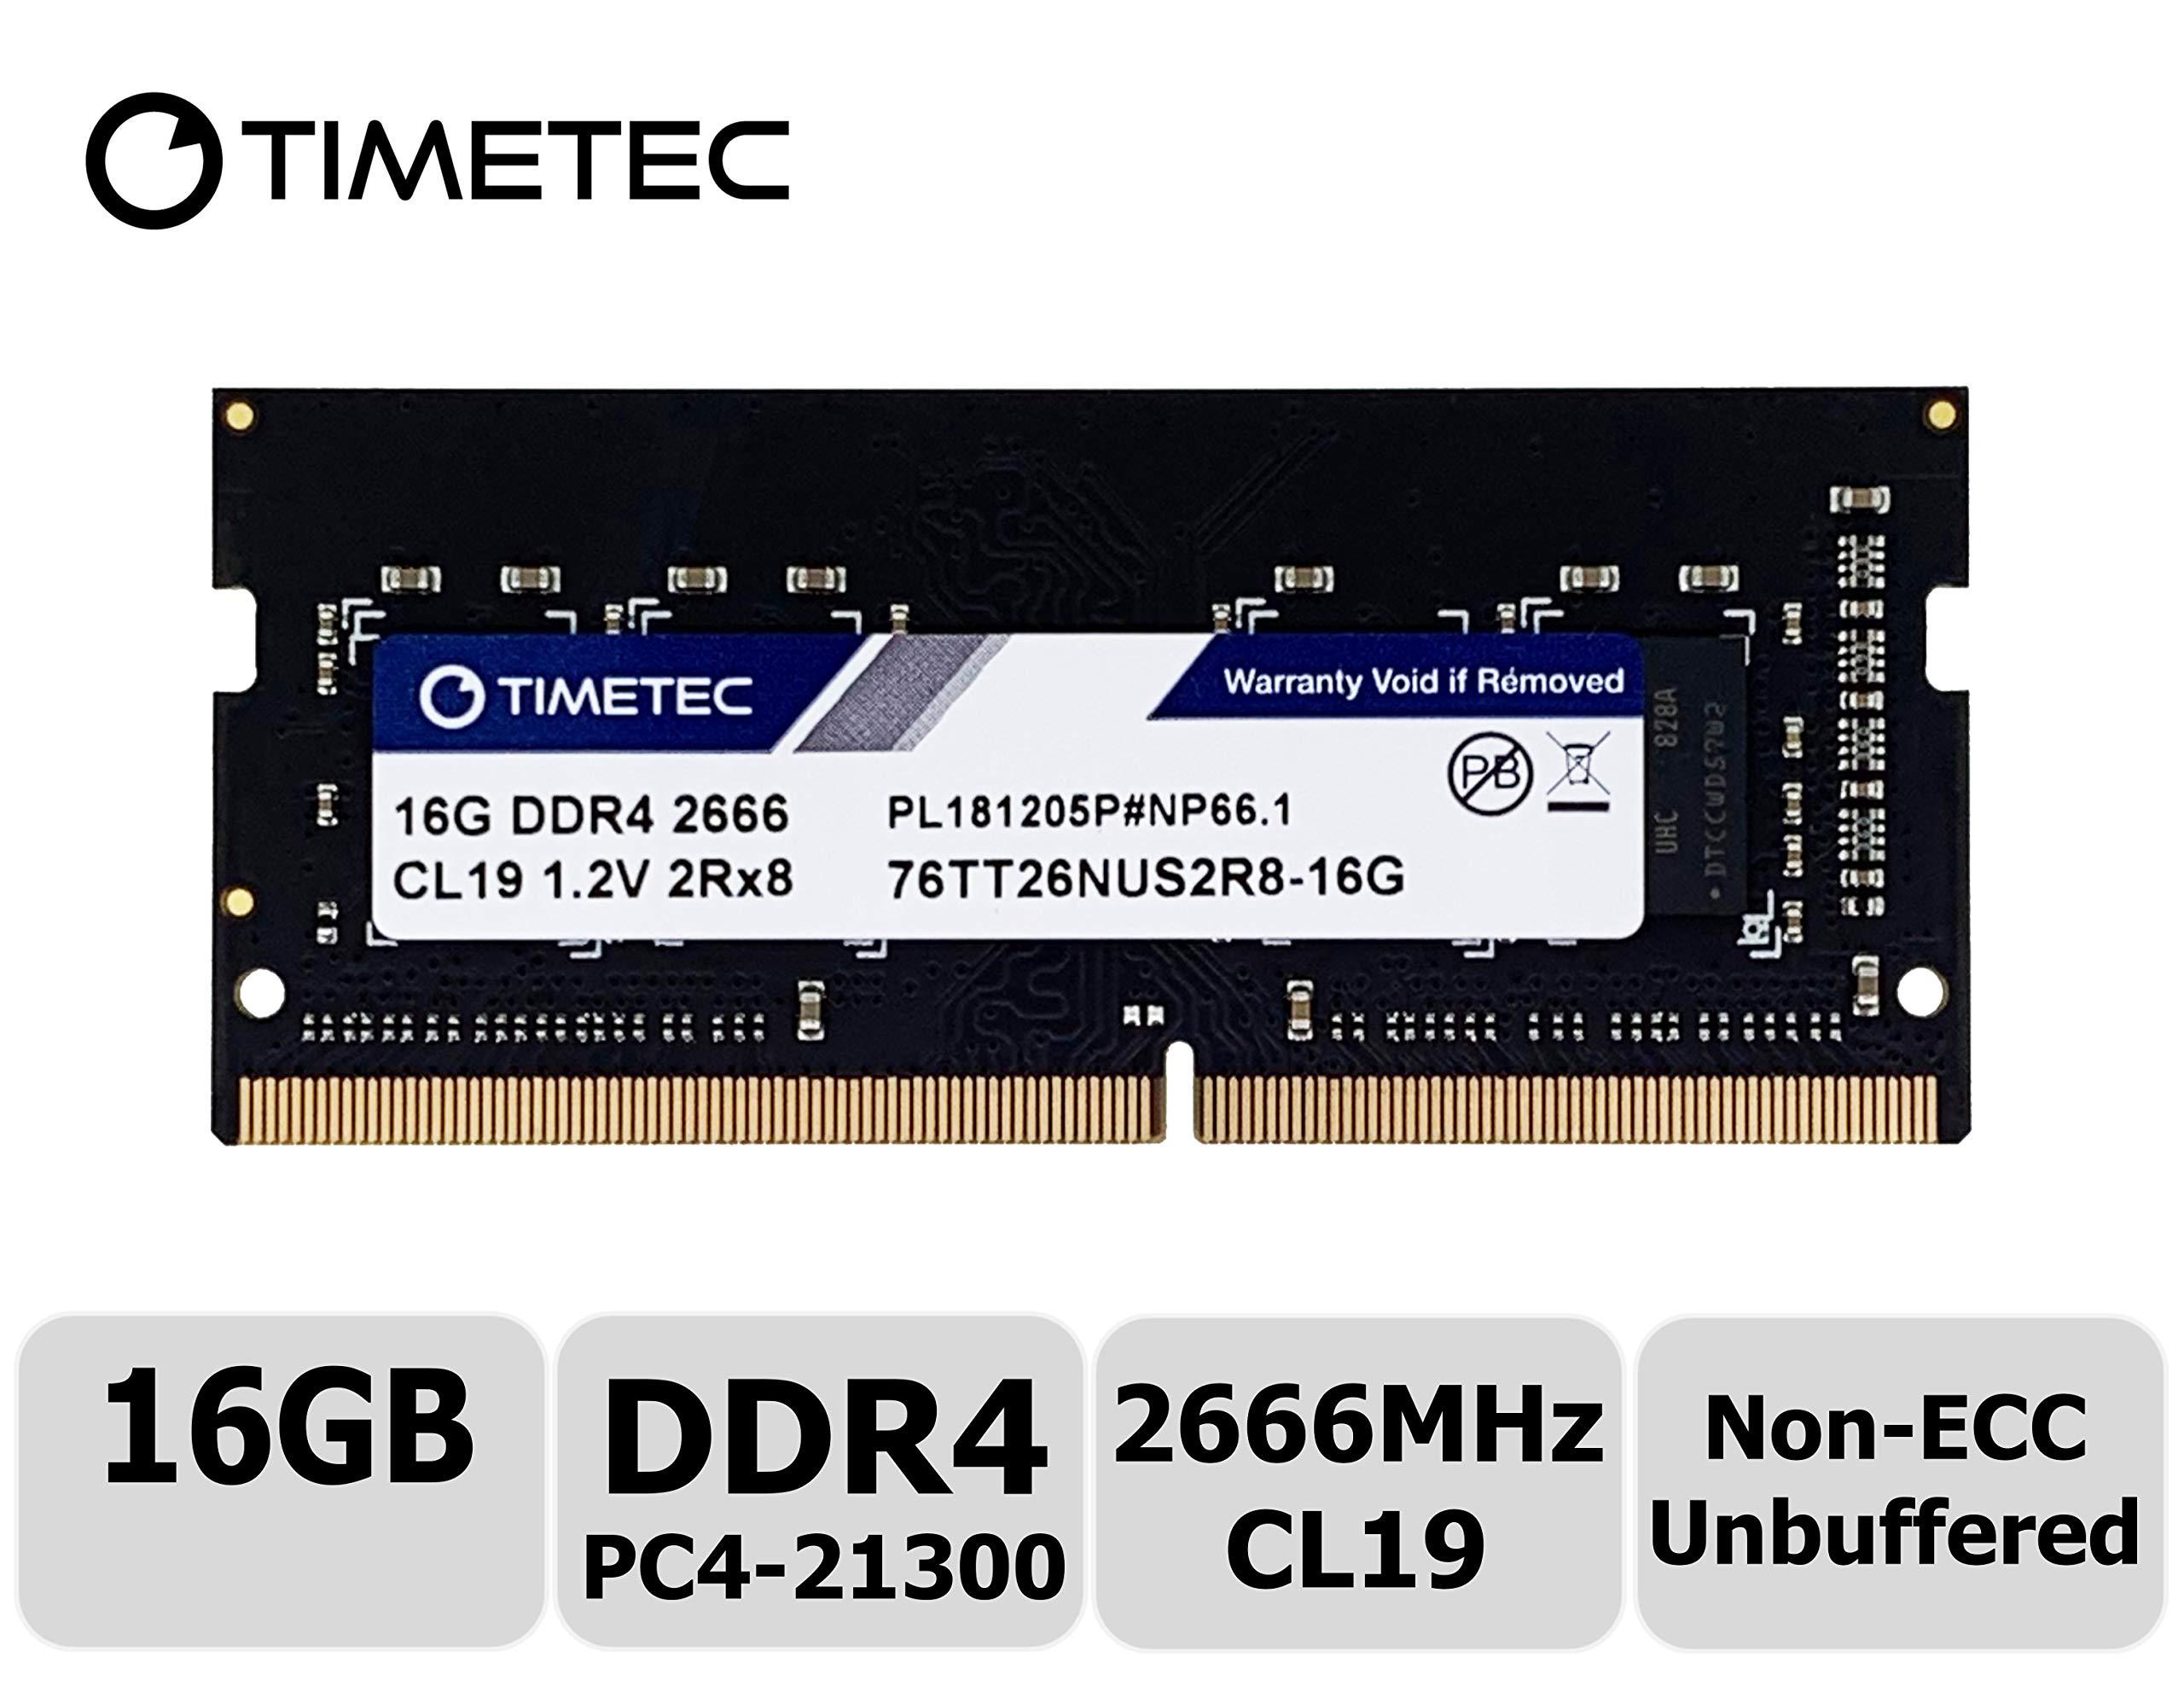 Memoria Ram 16GB DDR4 2666MHZ PC4-21300 SODIMM TIMETEC